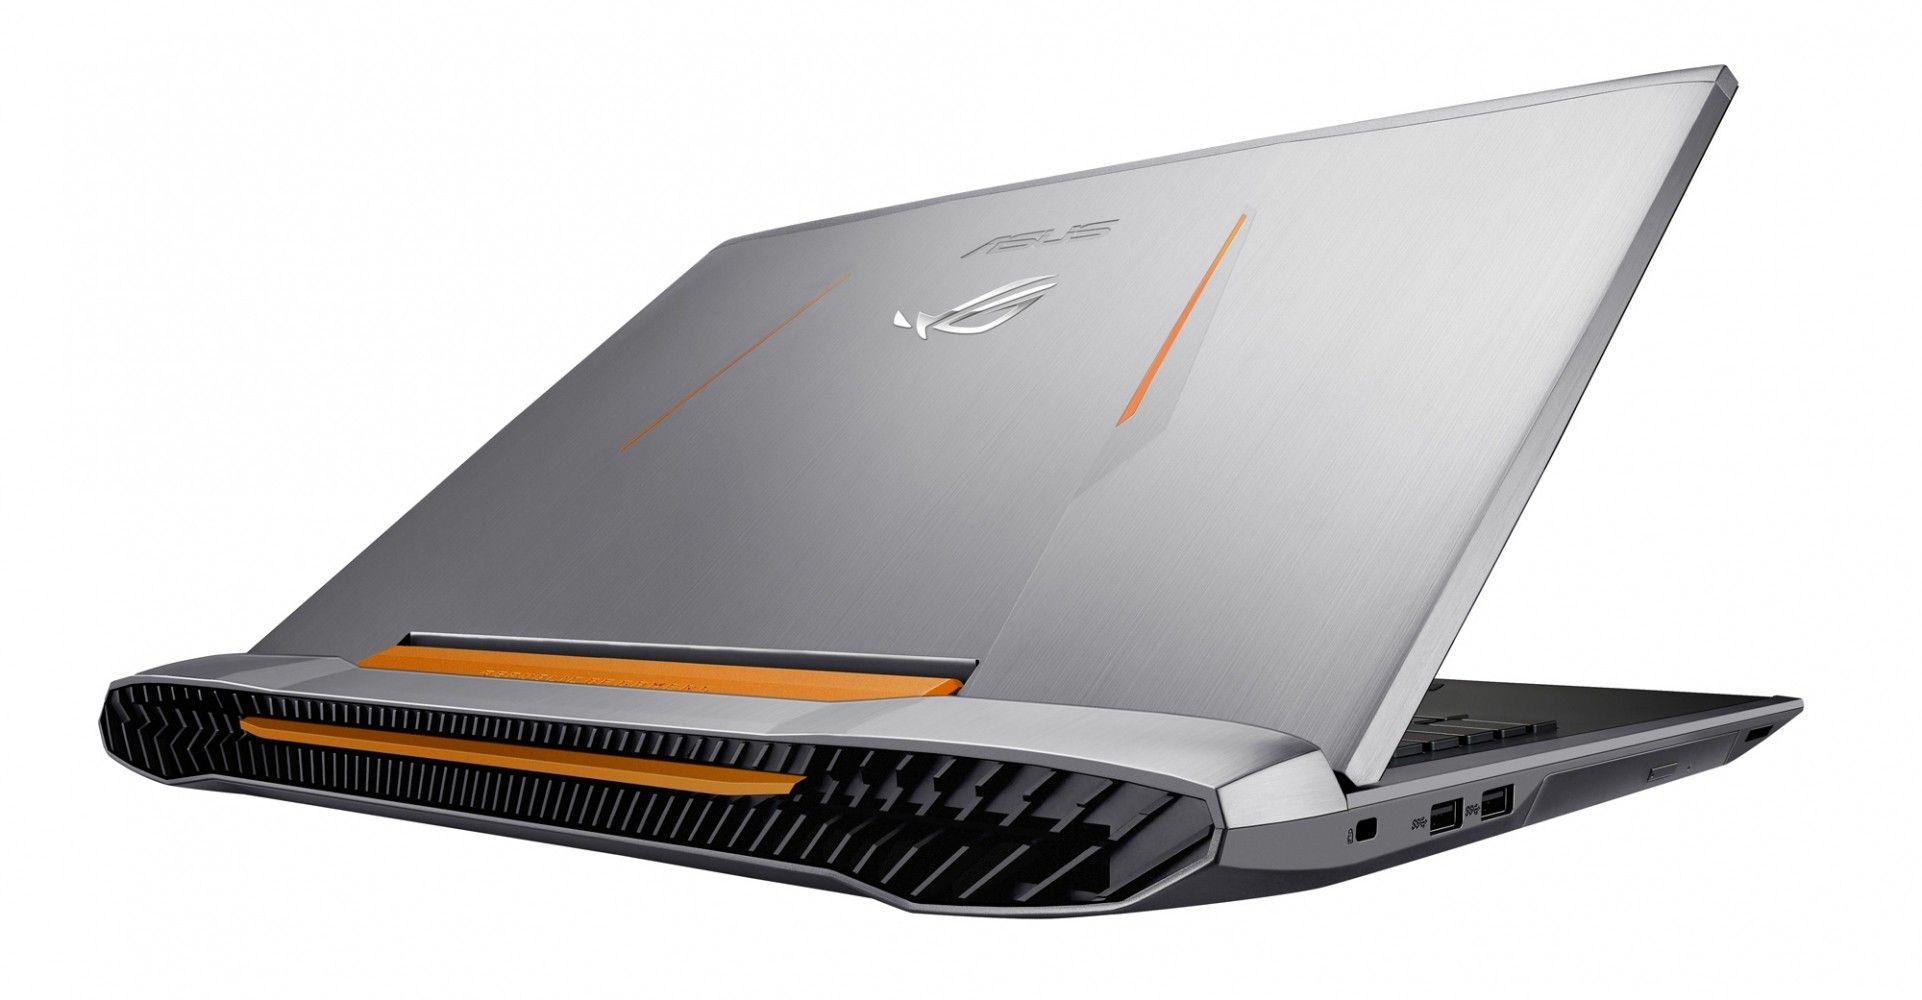 Ноутбук Asus ROG G752VL (G752VL-T7032T) - 1